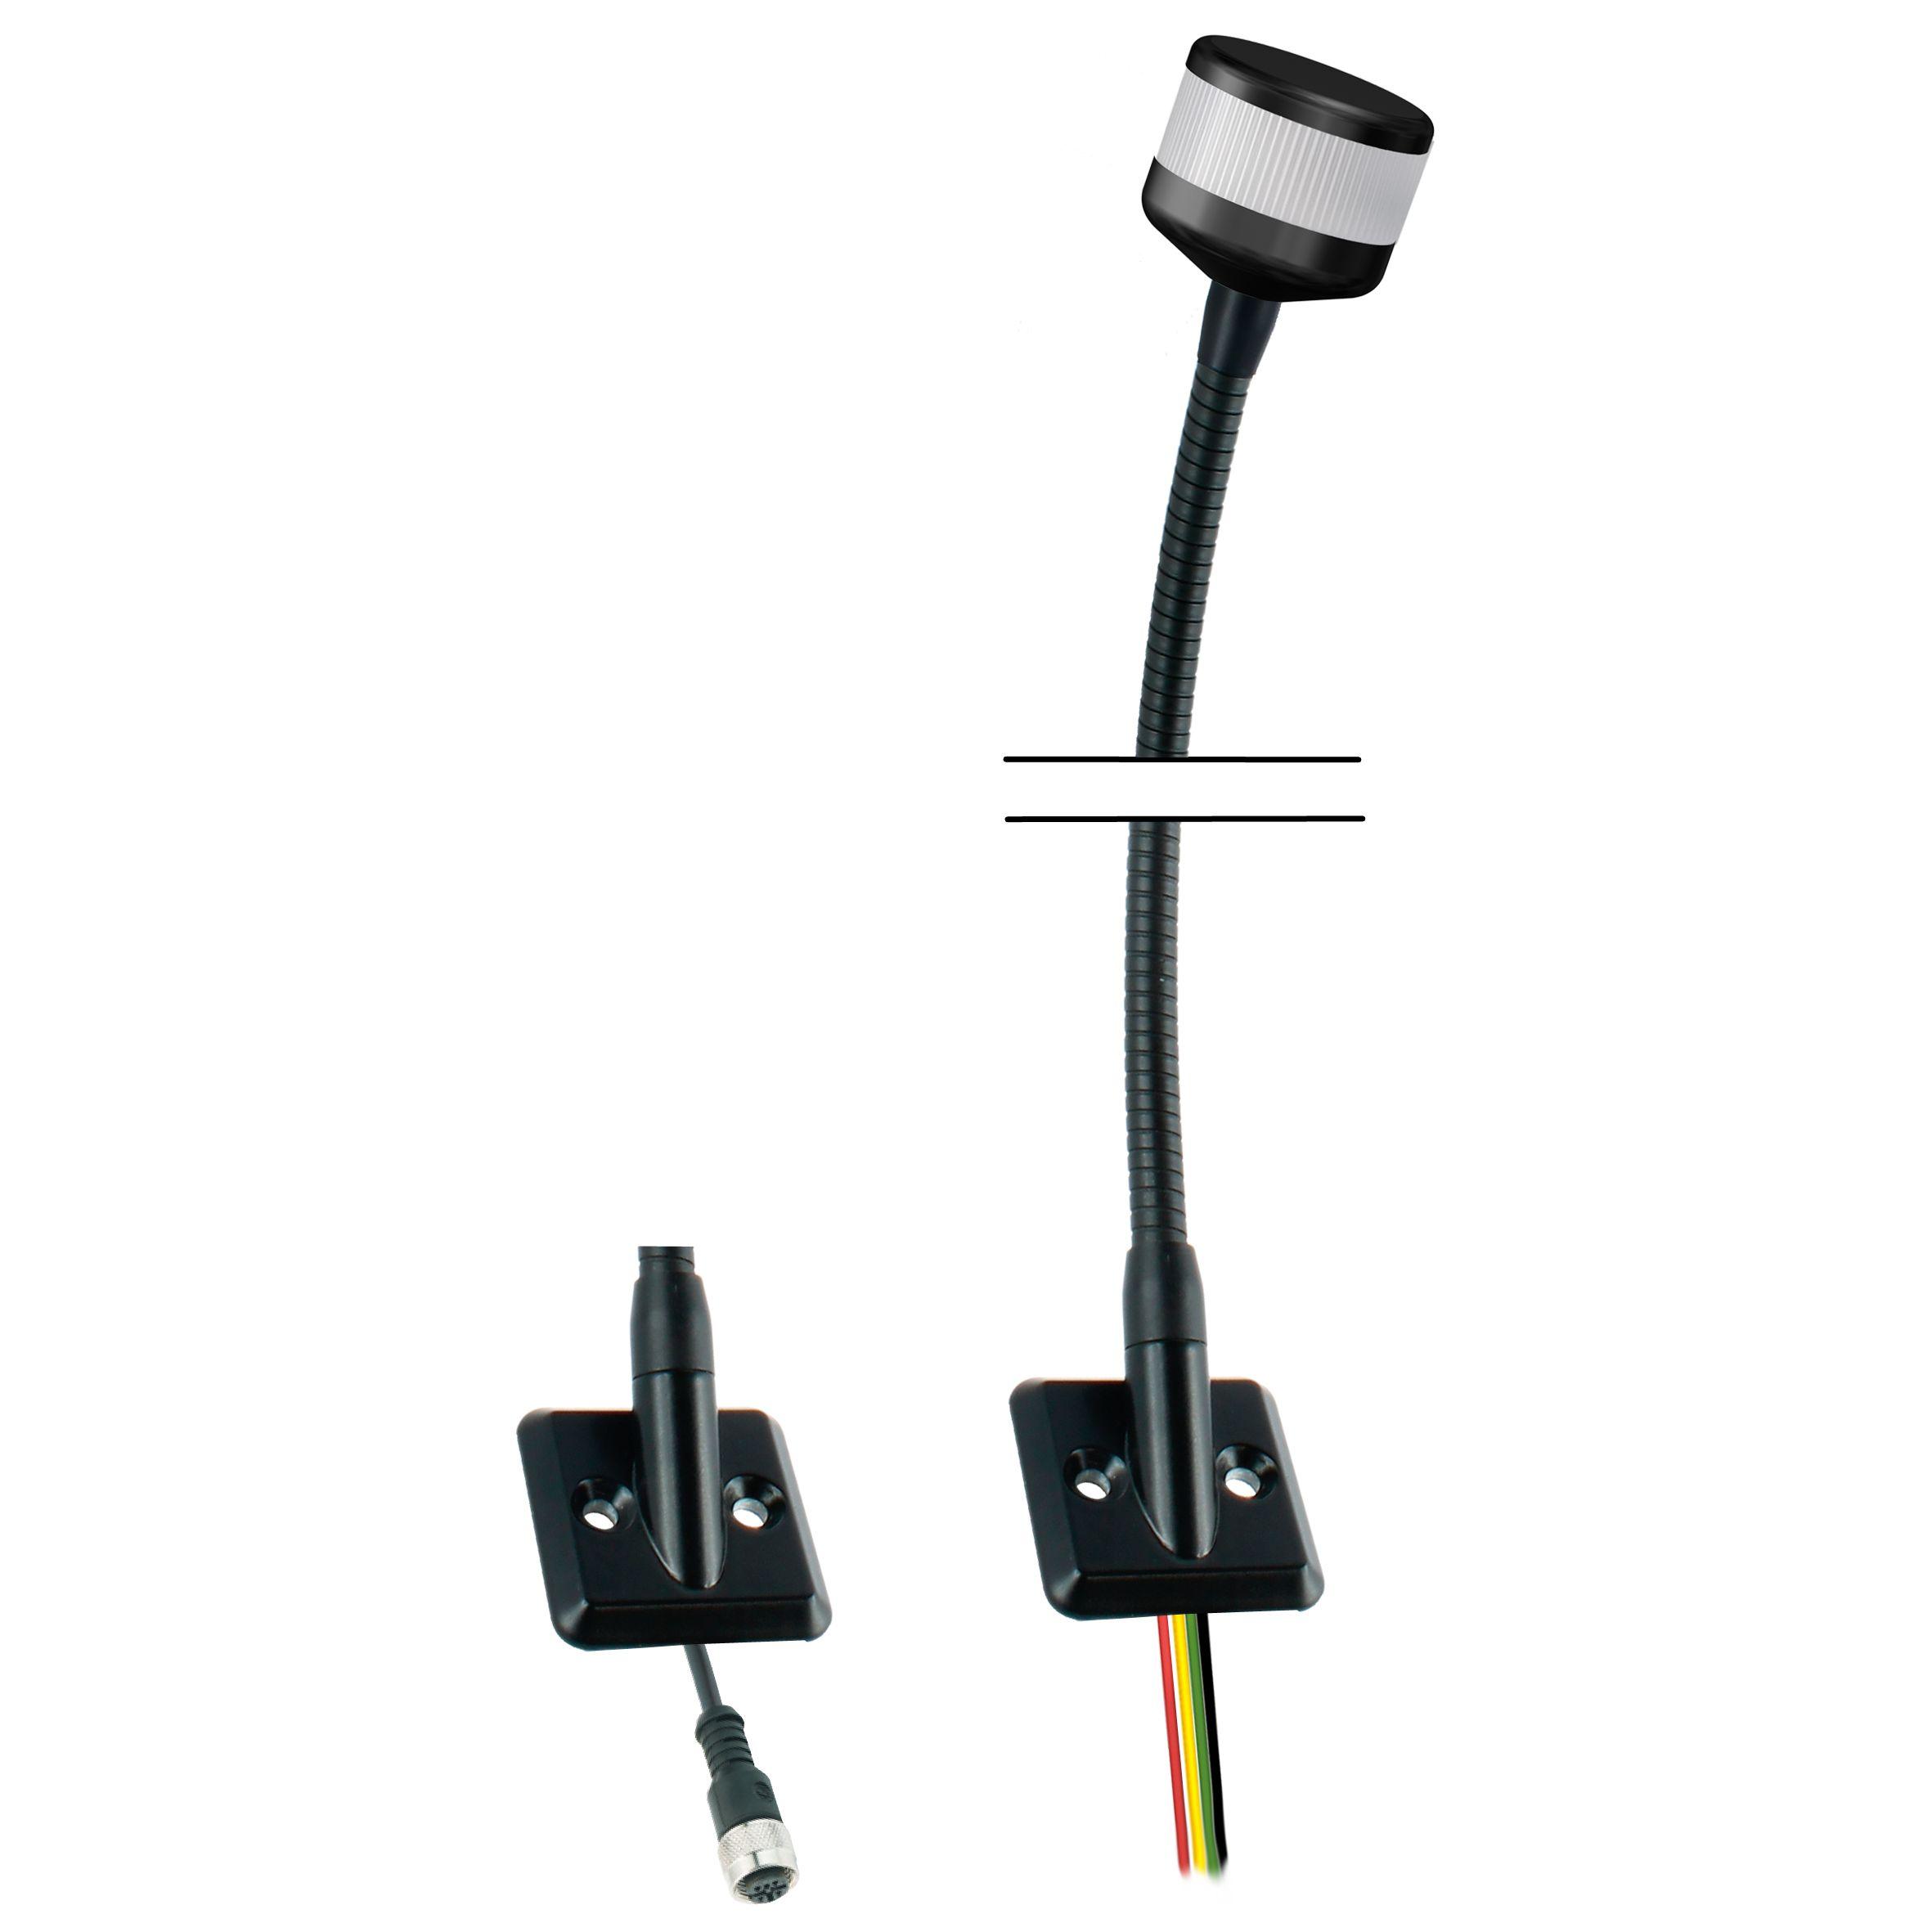 LED-Kompakt-Towerlampe in RYG mit Befestigungs-Flansch